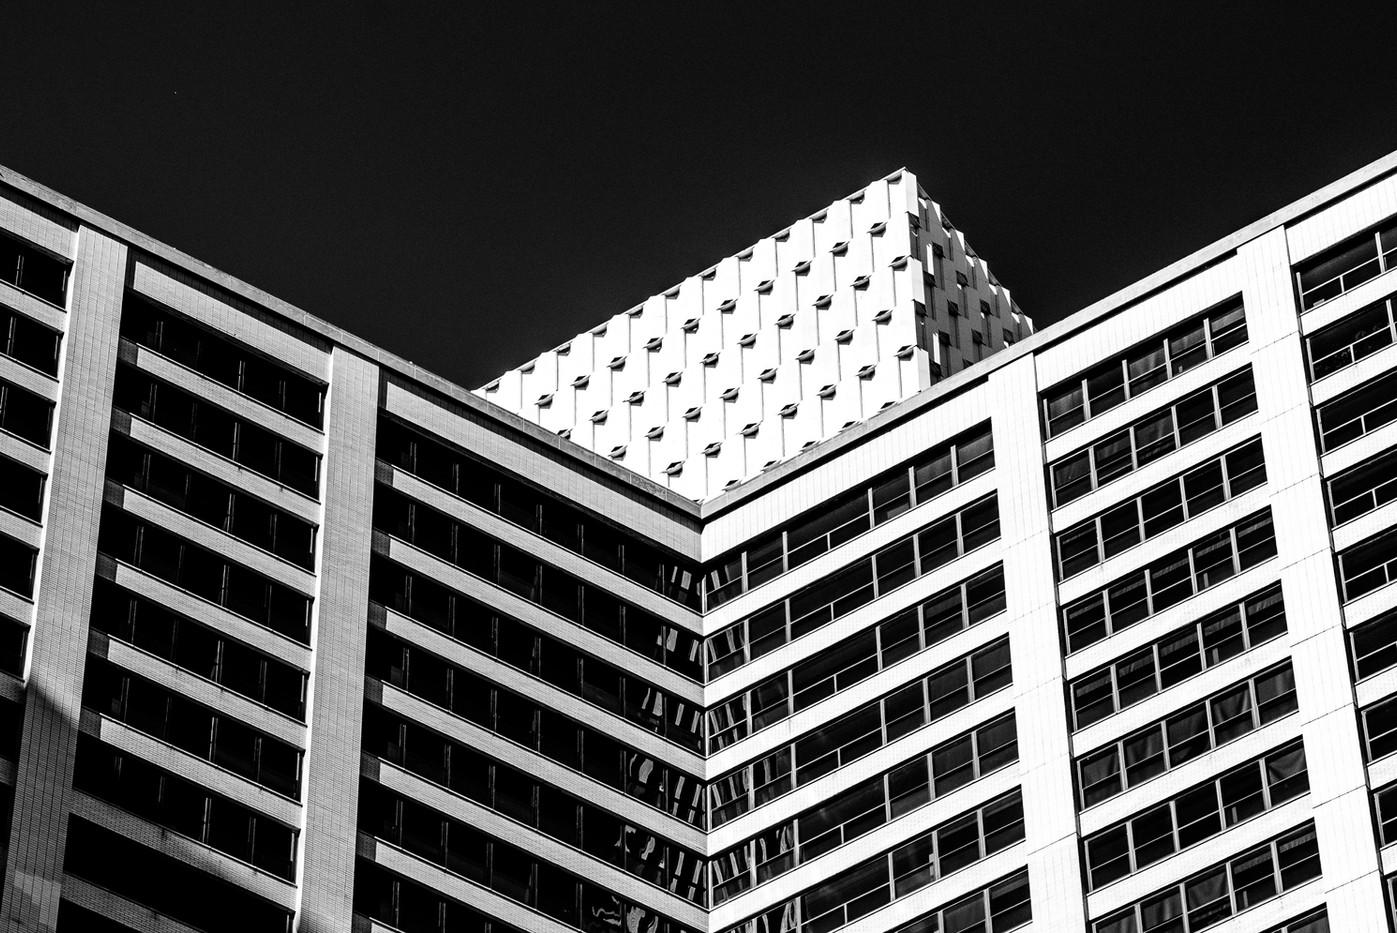 Archistructures #9